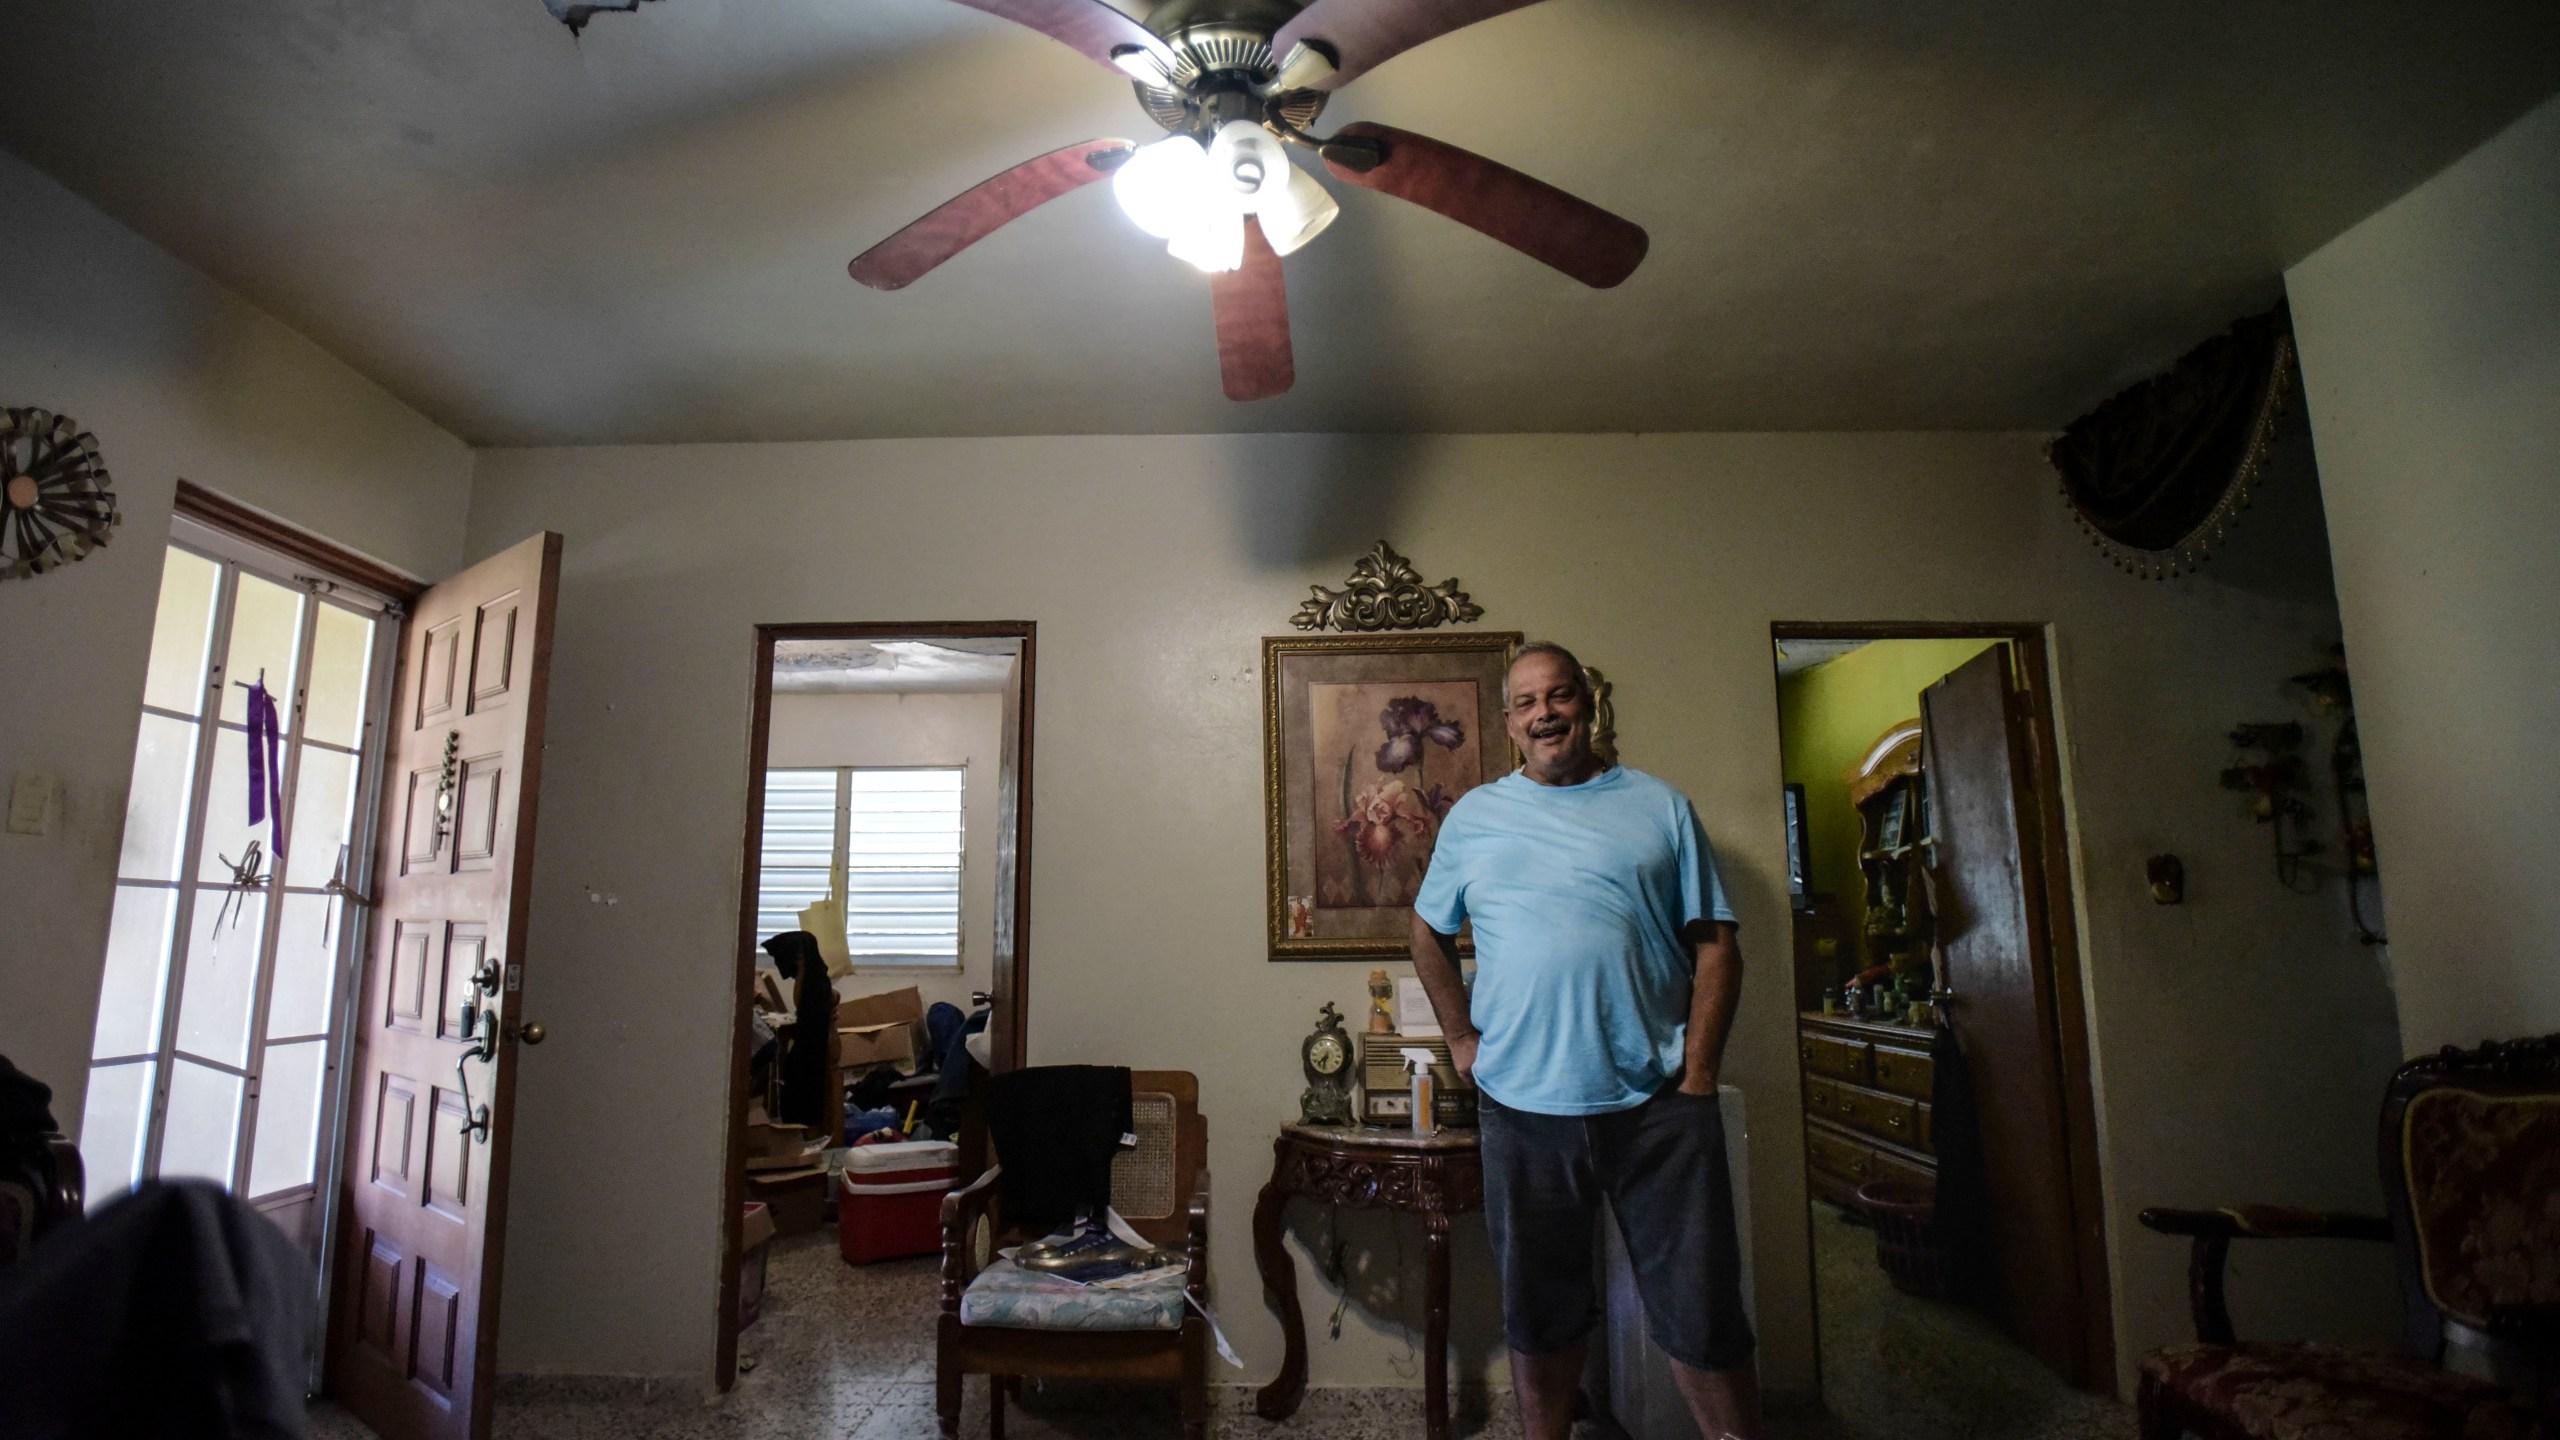 Puerto_Rico_DIY_Power_81244-159532.jpg93103054